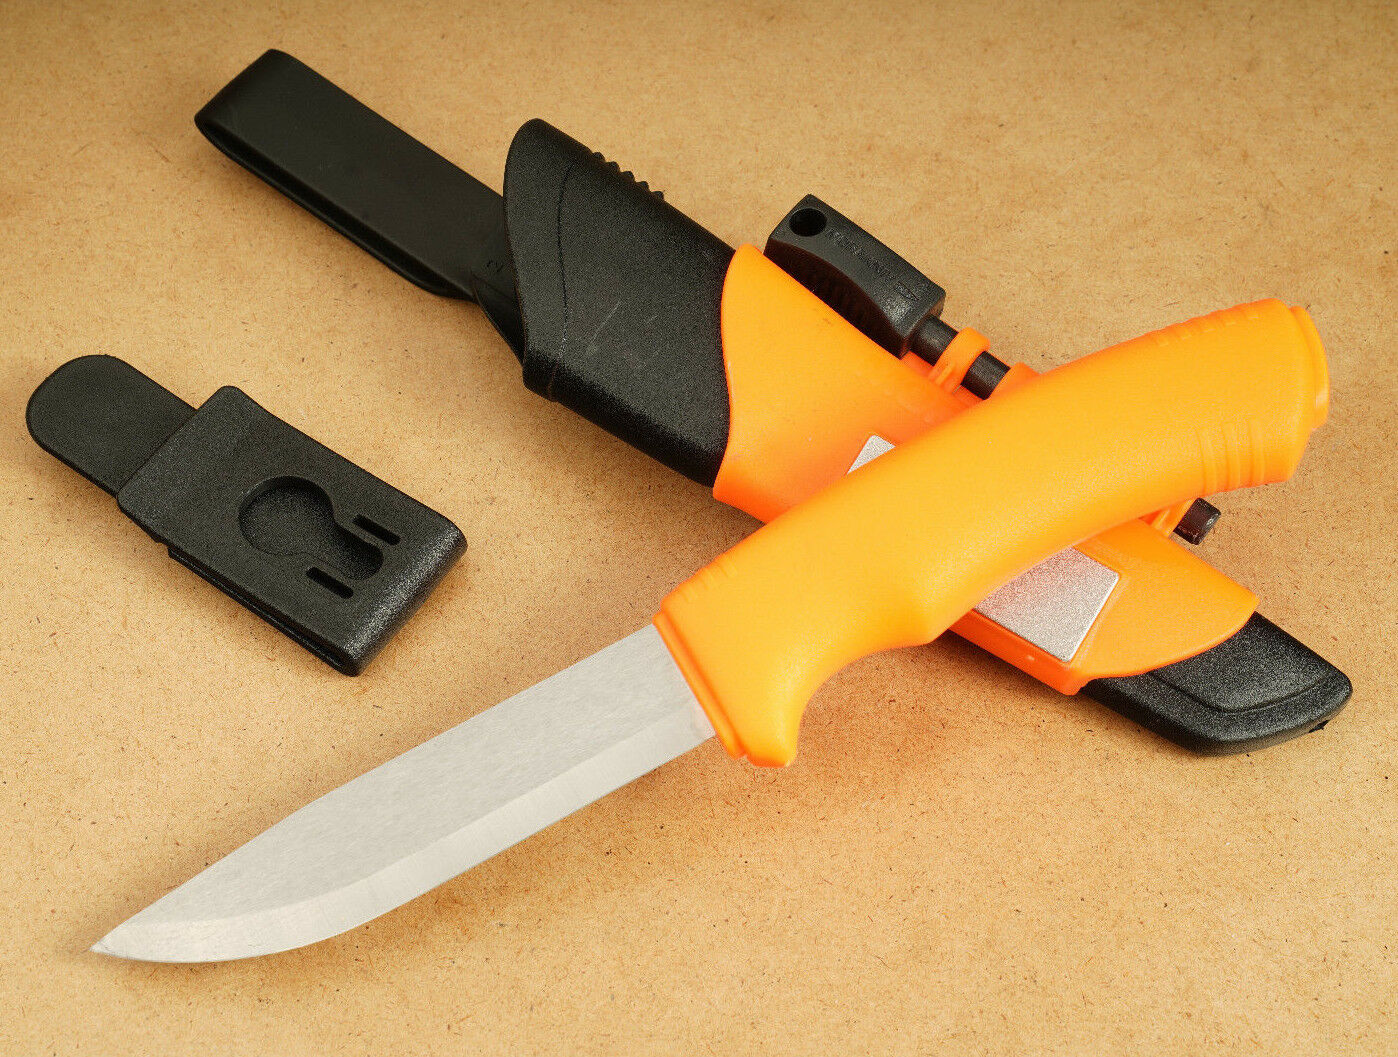 Morakniv Bushcraft Survival neon Orange Jagdmesser Outdoormesser Survival R60  | Lebensecht